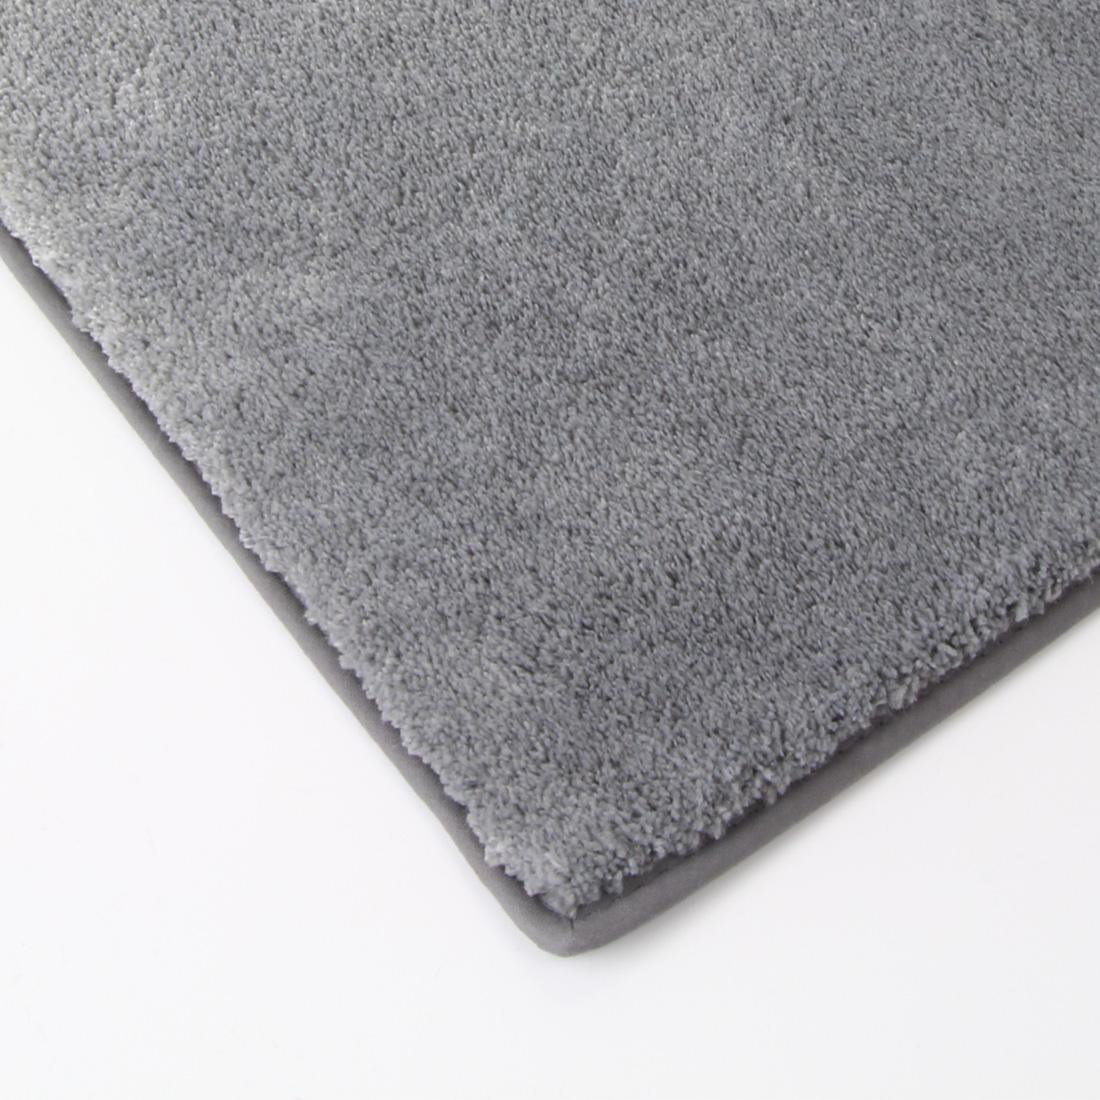 Vloerkleed Xilento Touch Ash (extra zacht)